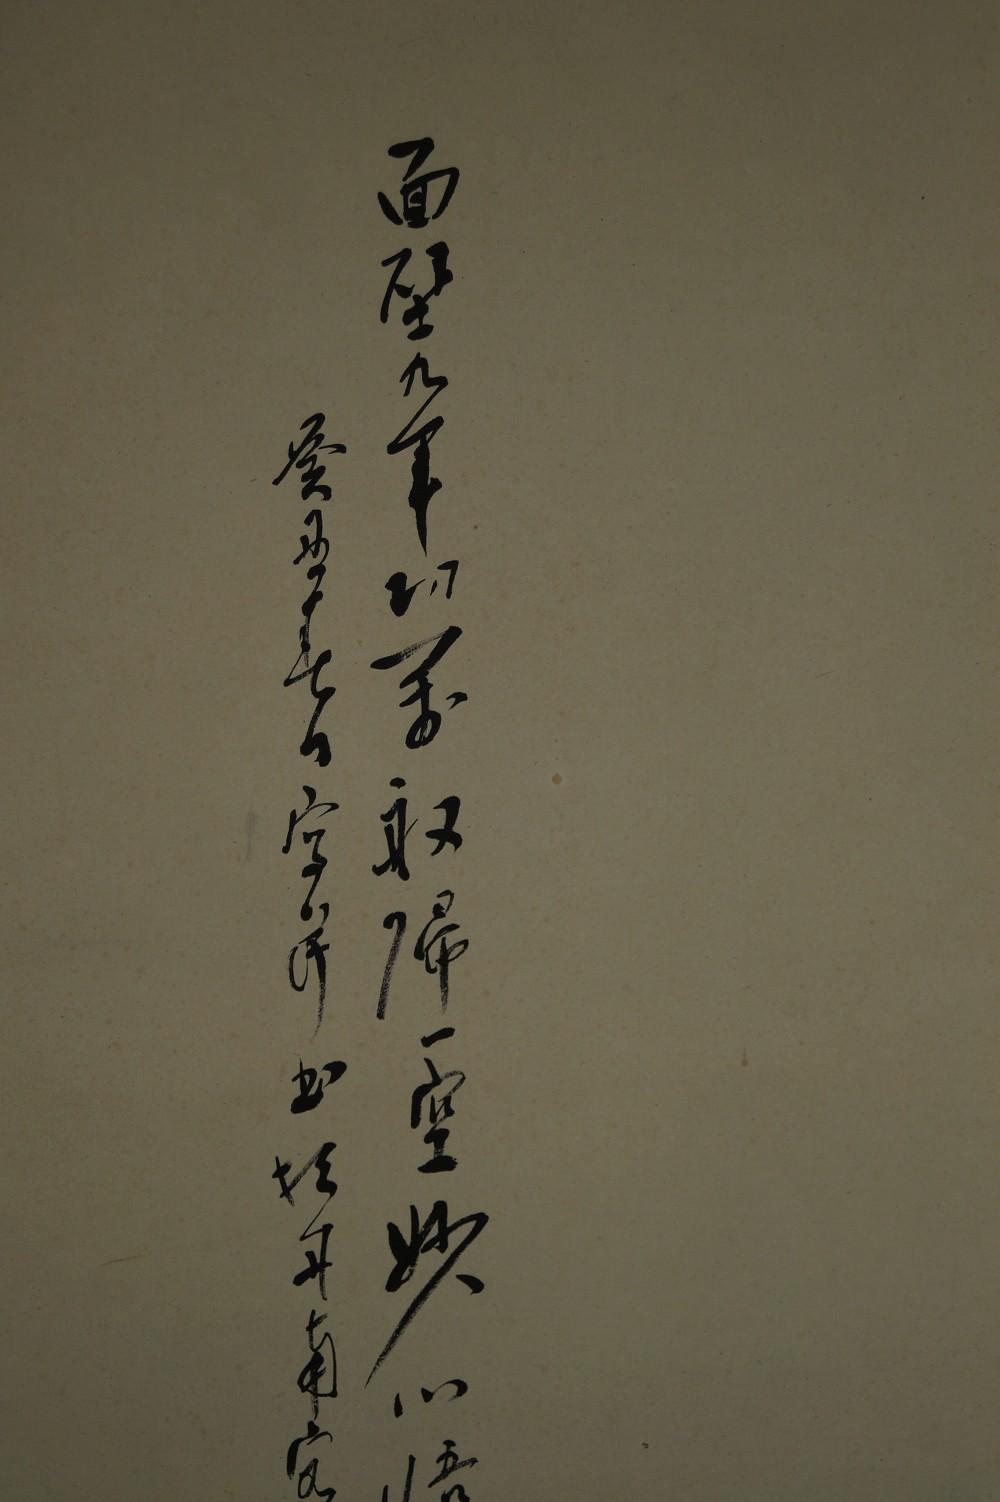 Bodhidharma (Daruma) - japanisches Rollgemälde (Kakejiku, Kakemono)